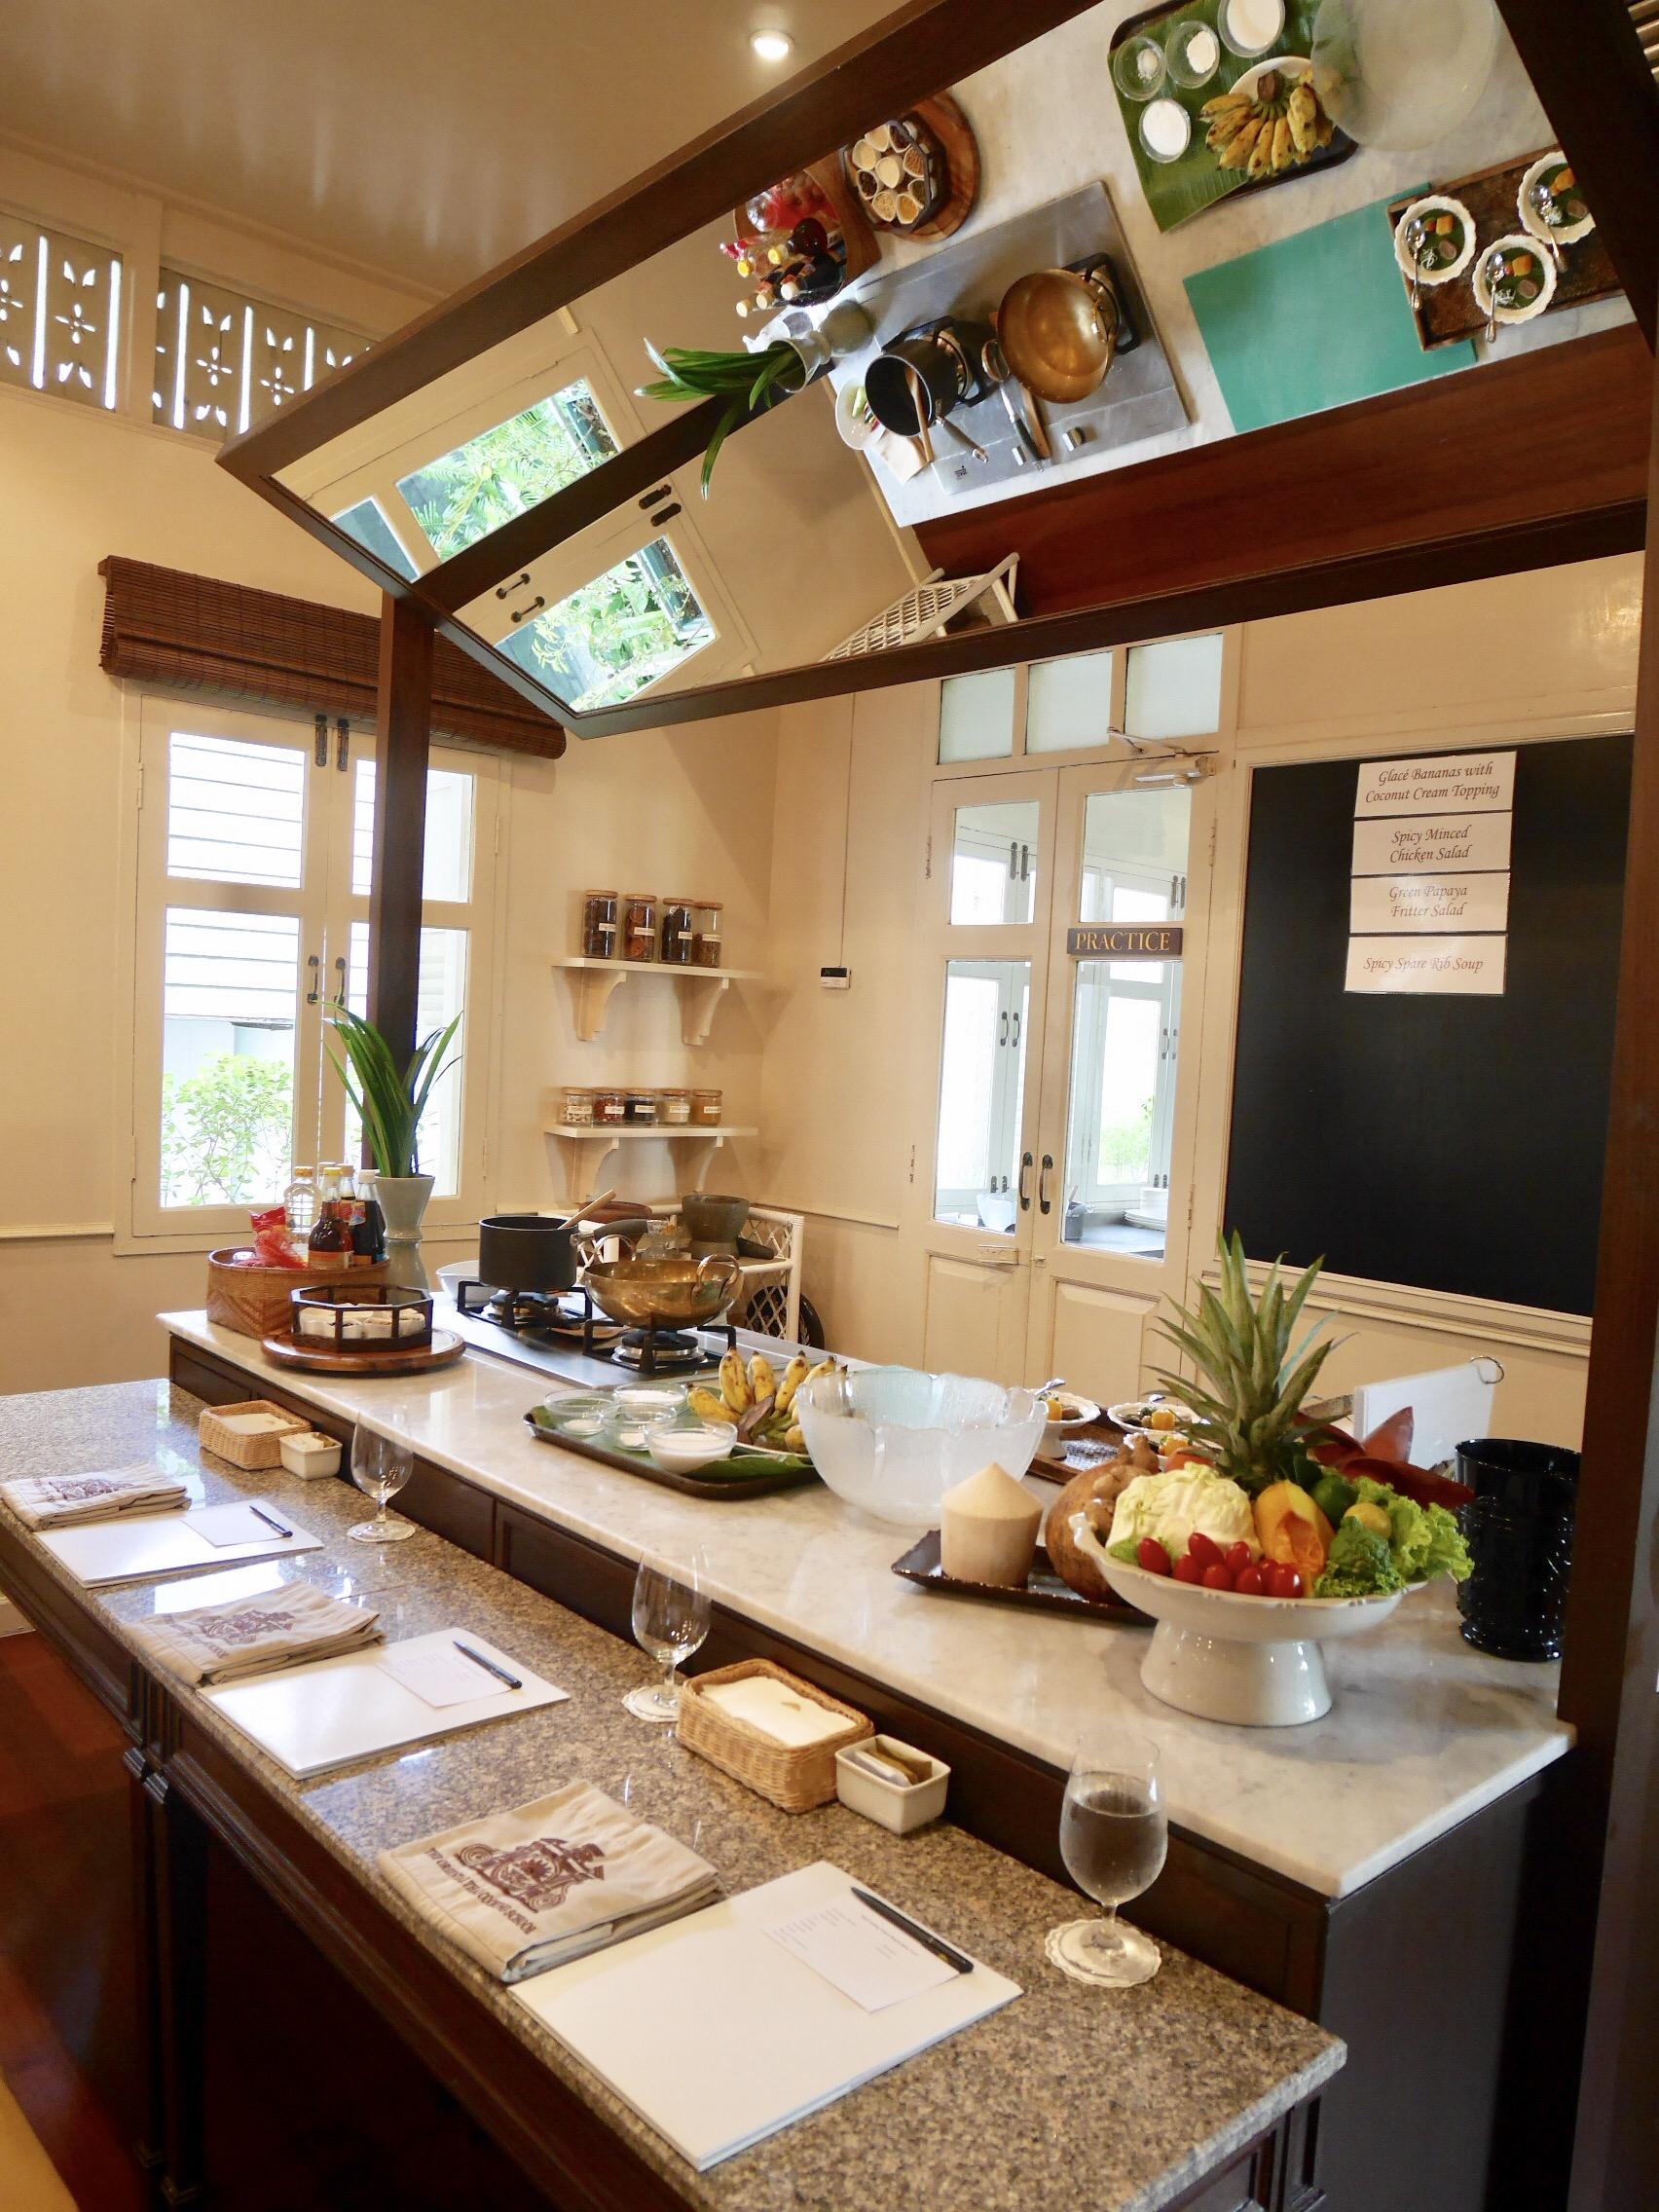 img 9102 1 - The Oriental Thai Cooking School - マンダリンオリエンタルバンコクのおもてなし空間で体験する絶品タイ料理教室